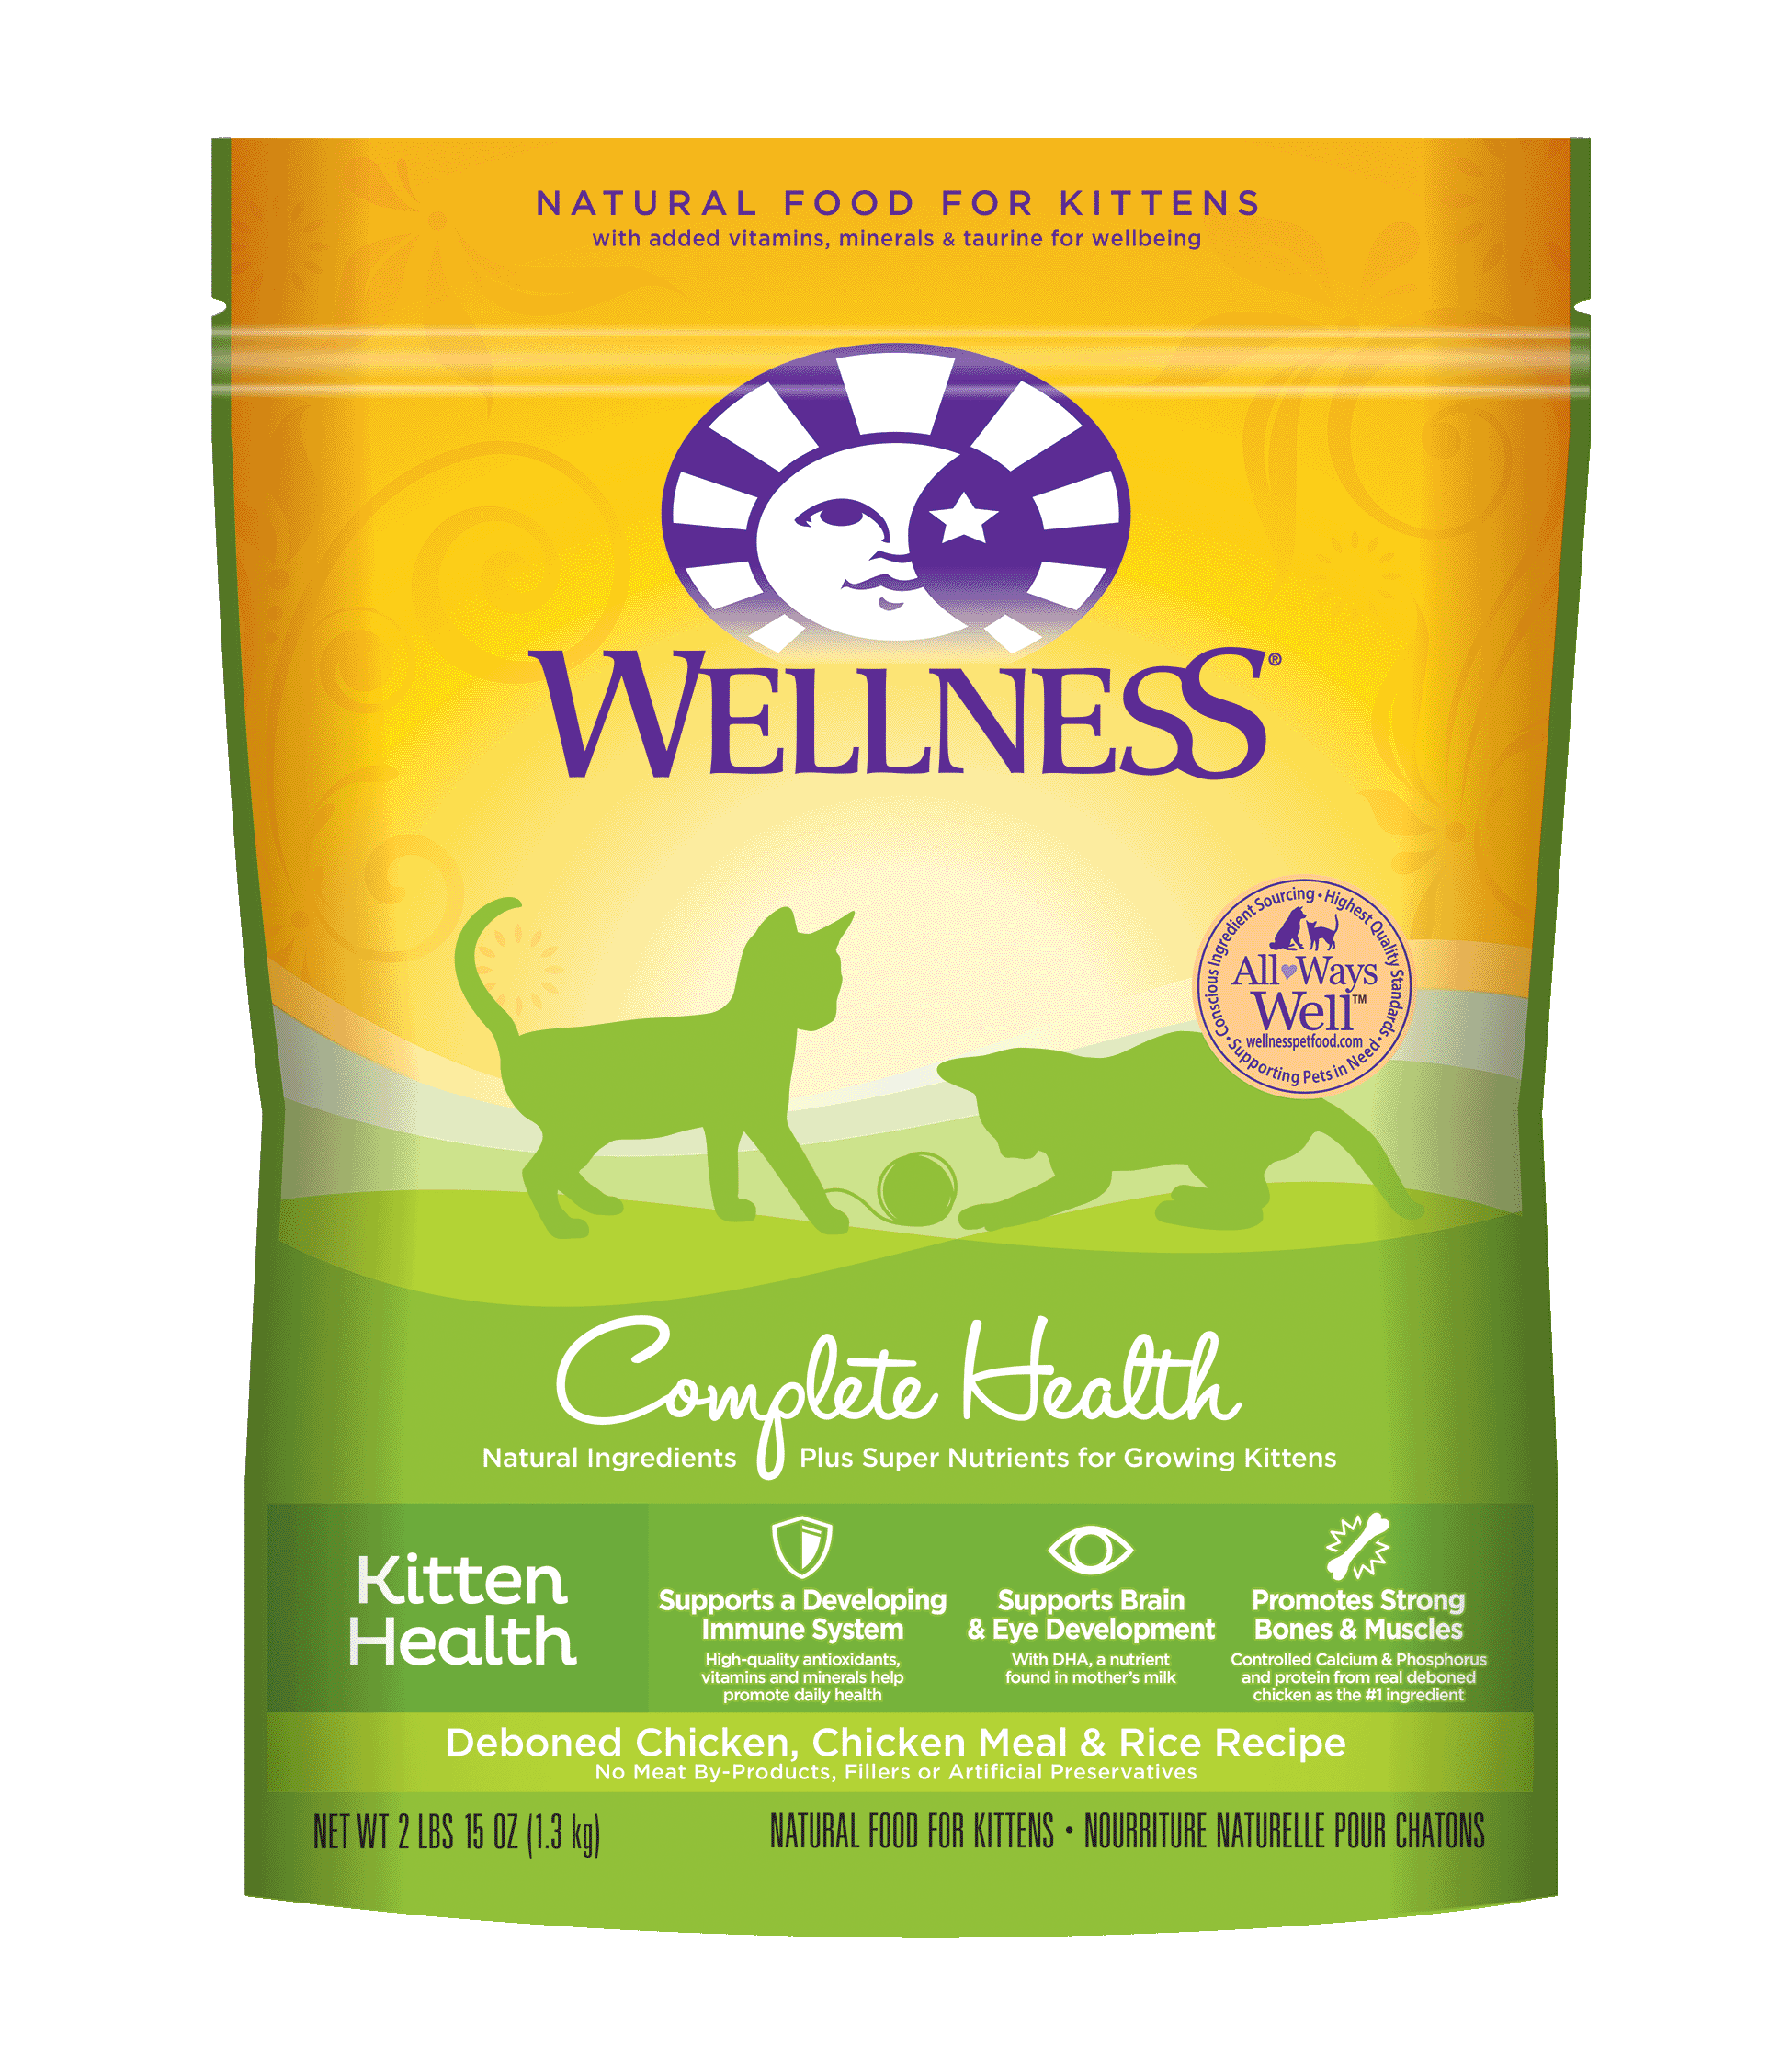 Complete Health Kitten Health